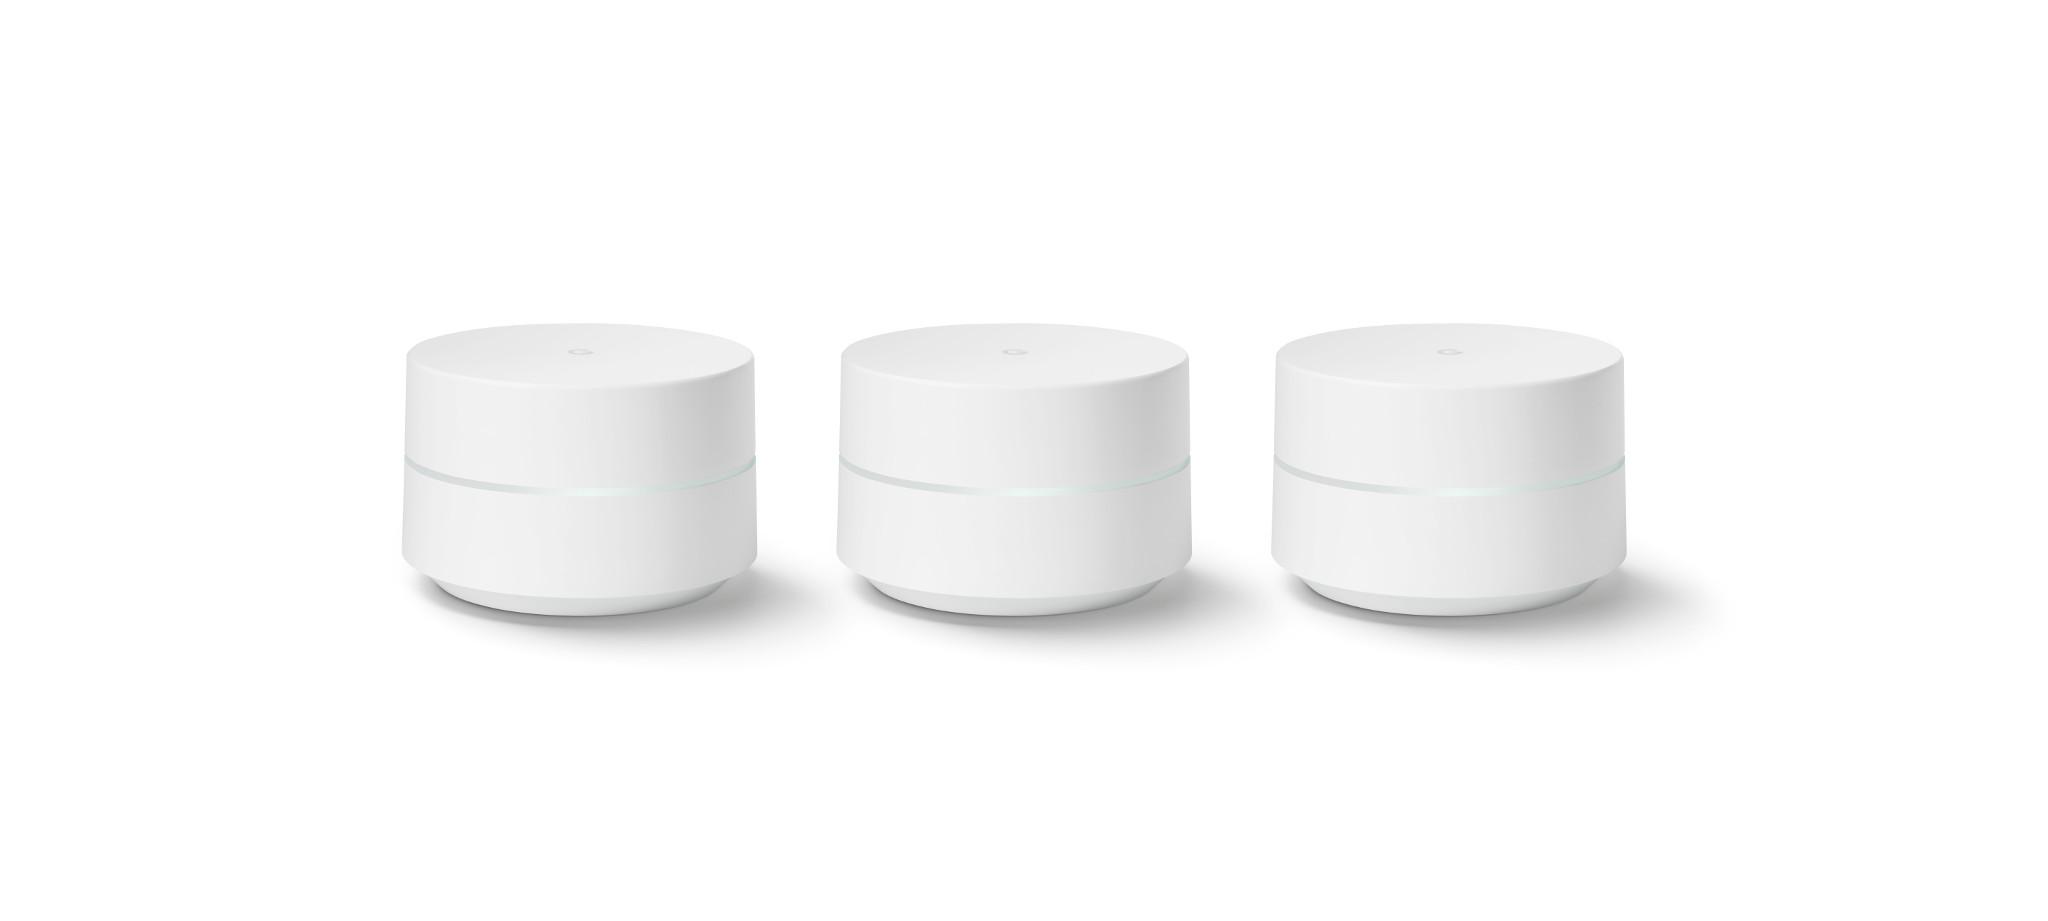 Google Wifi 3 pack 2